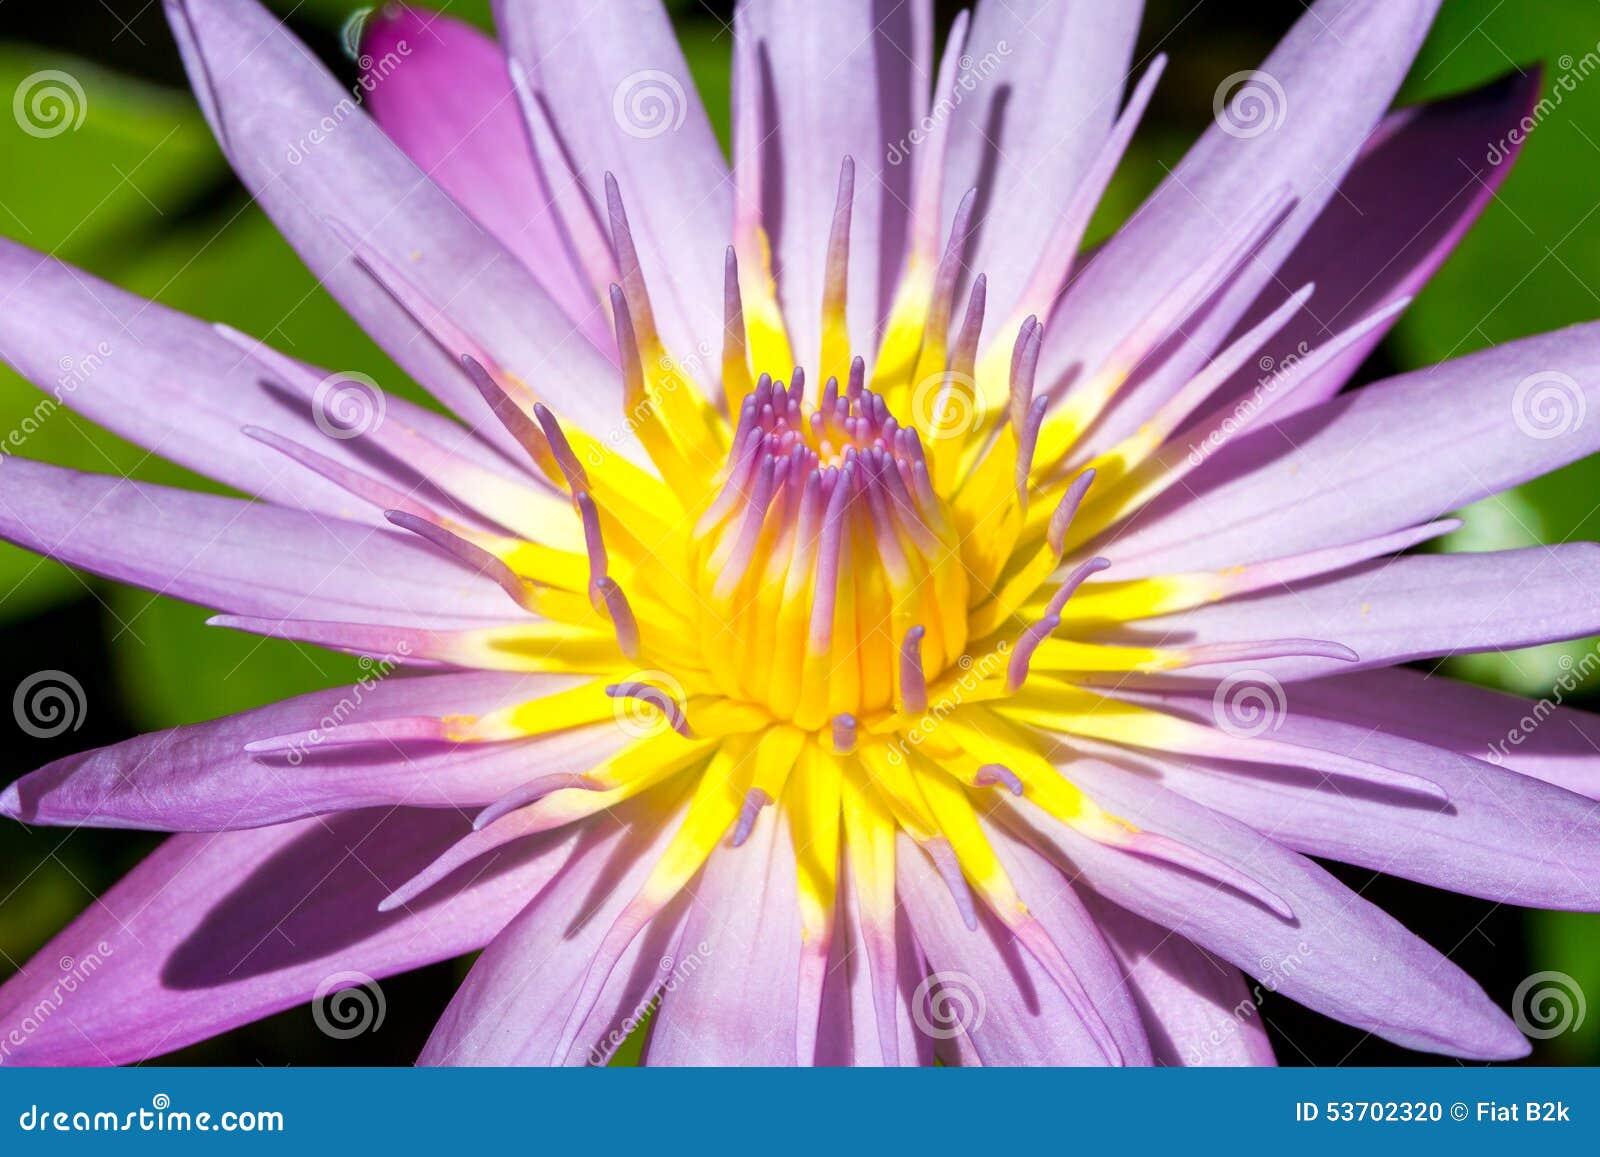 Carta Da Parati Fiori Di Loto : Fiore o ninfea di lotus vicina su per la carta da parati